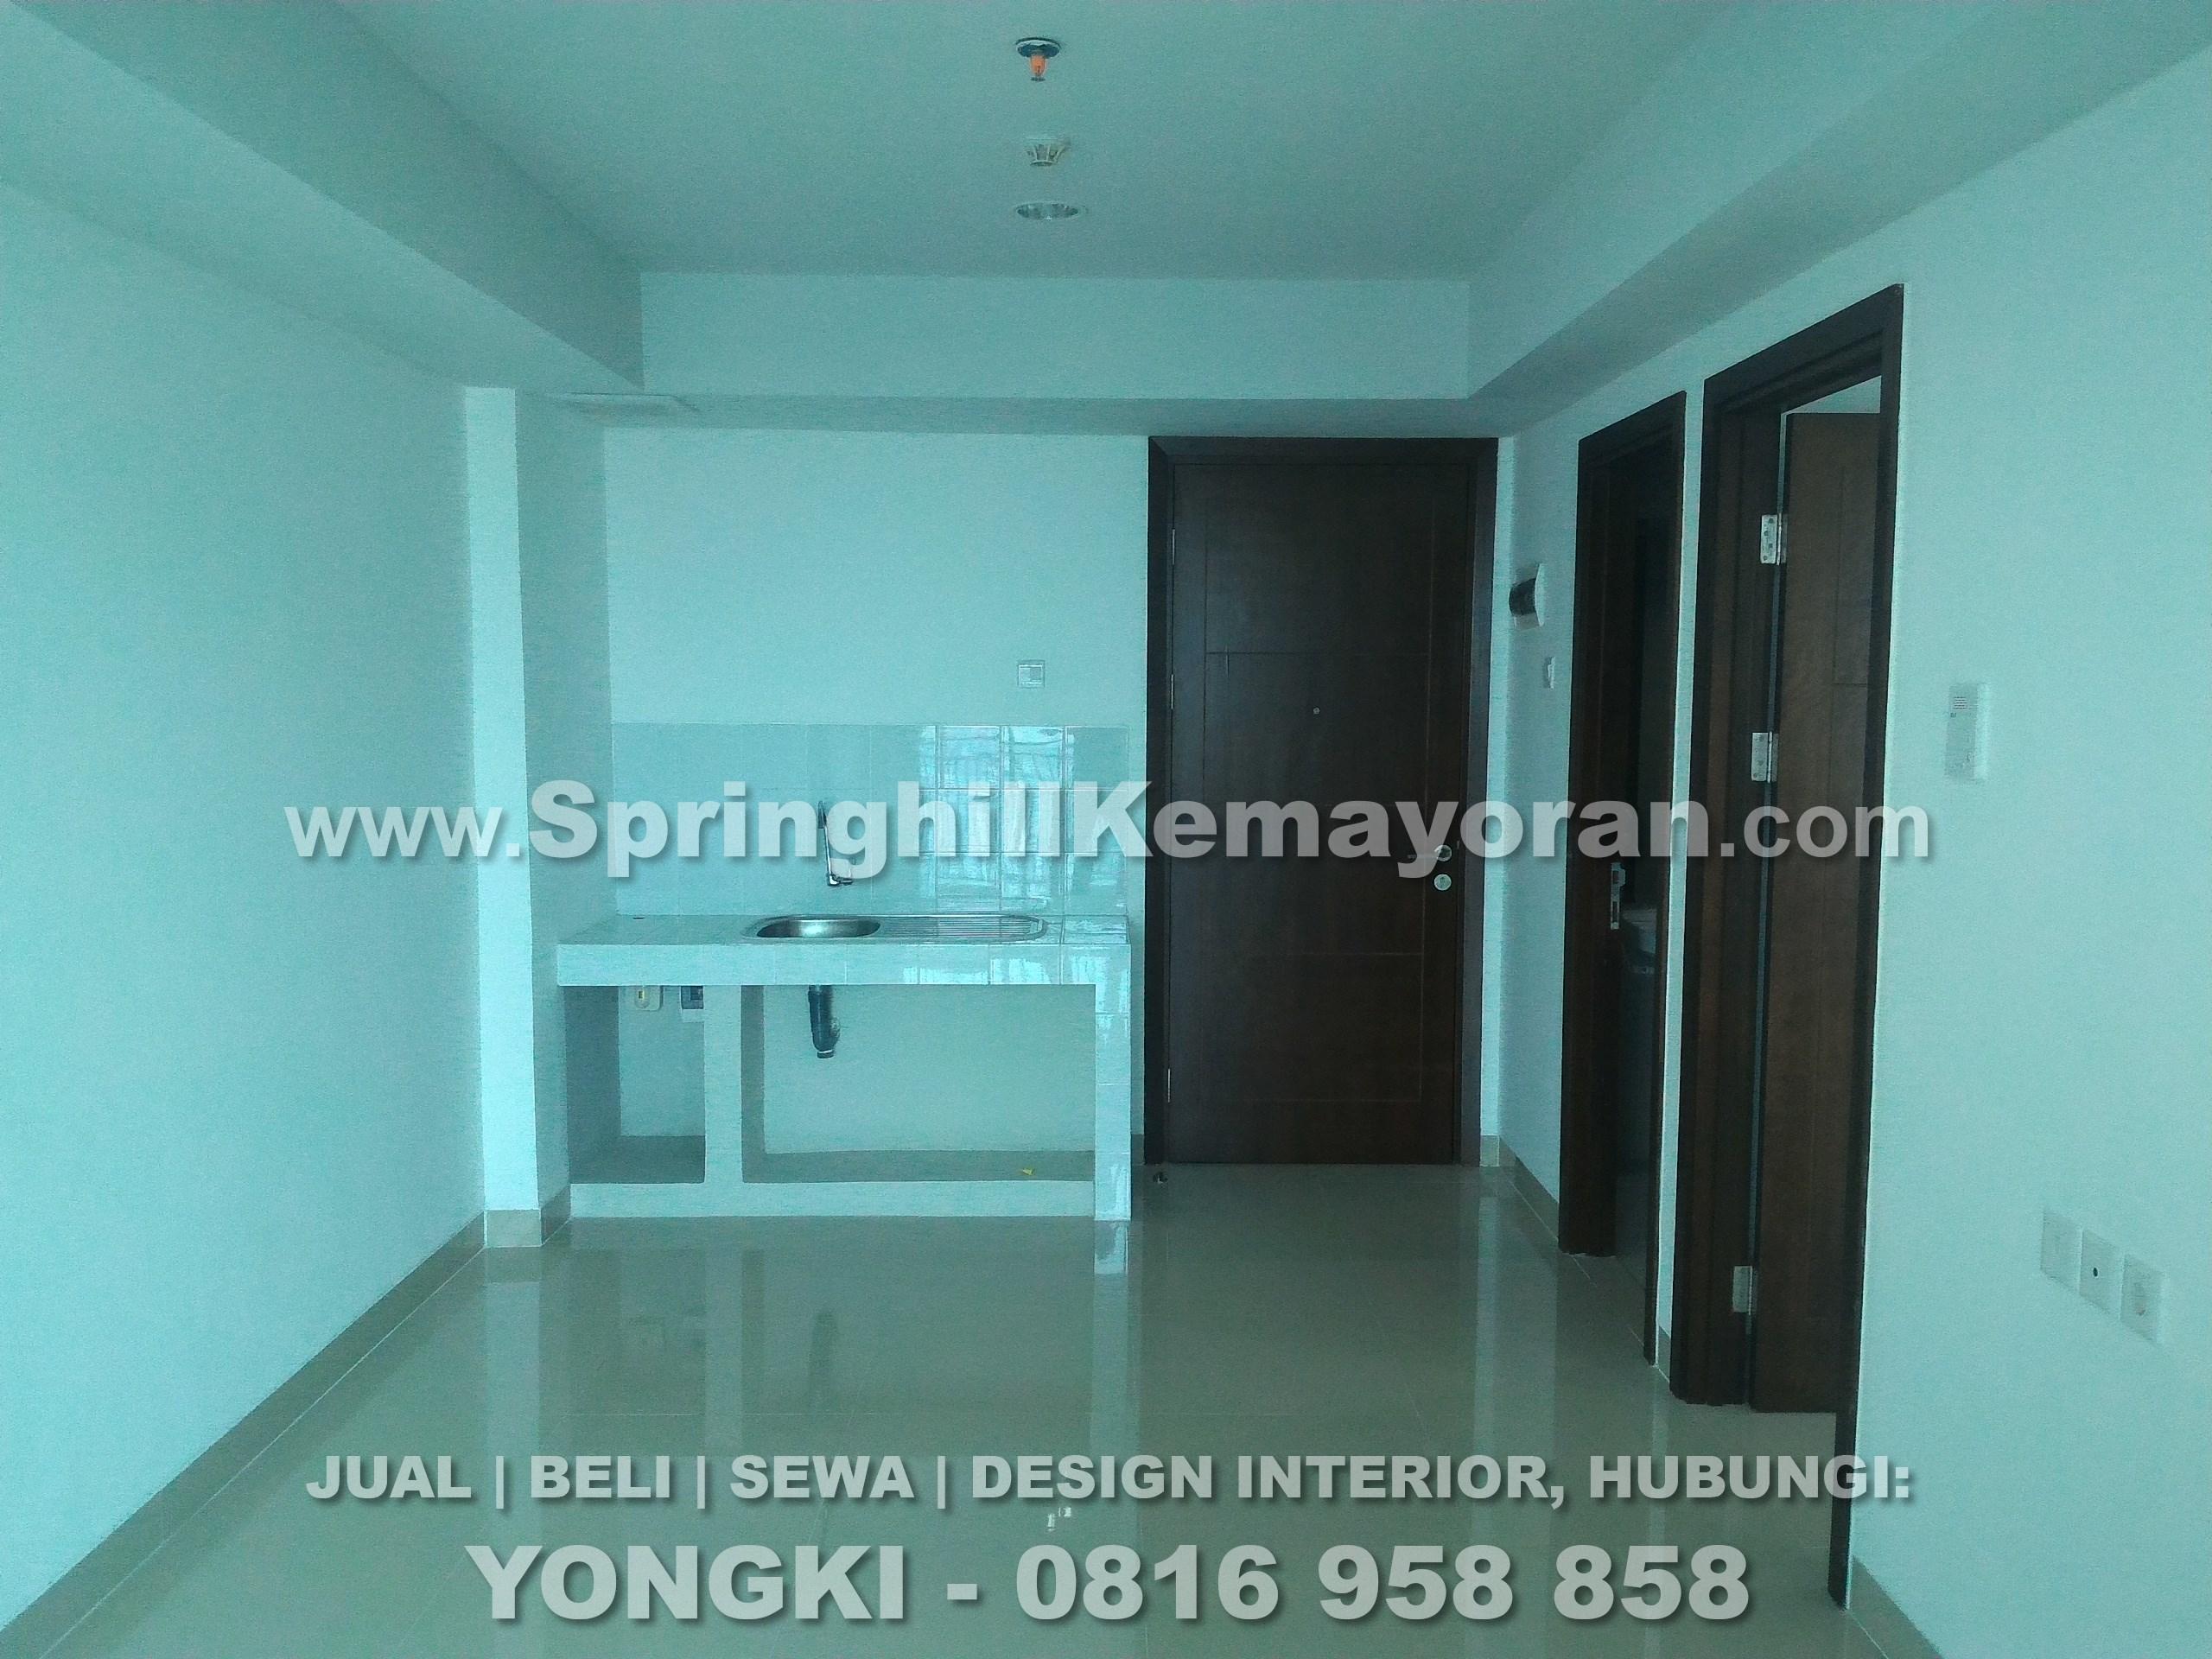 Springhill Terrace Kemayoran 4BR (SKC-6673)